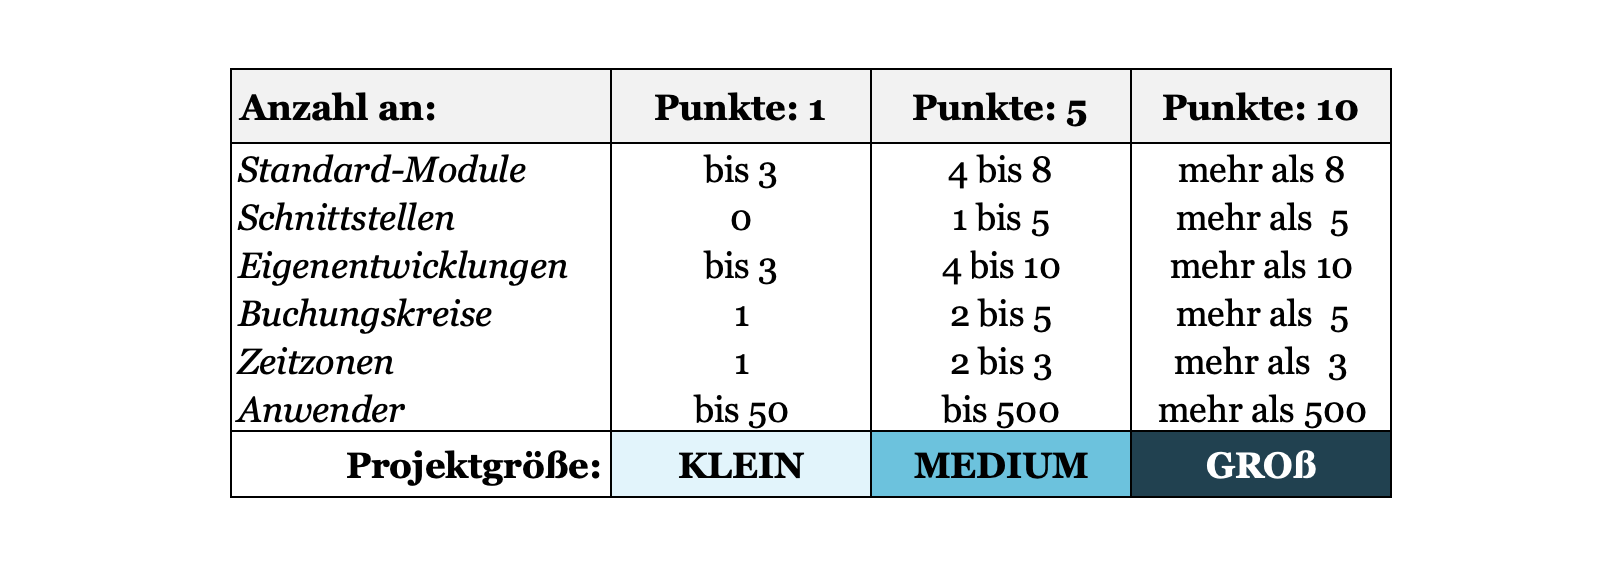 SAP-Projekttypen nach Projektgröße_Agilon GmbH